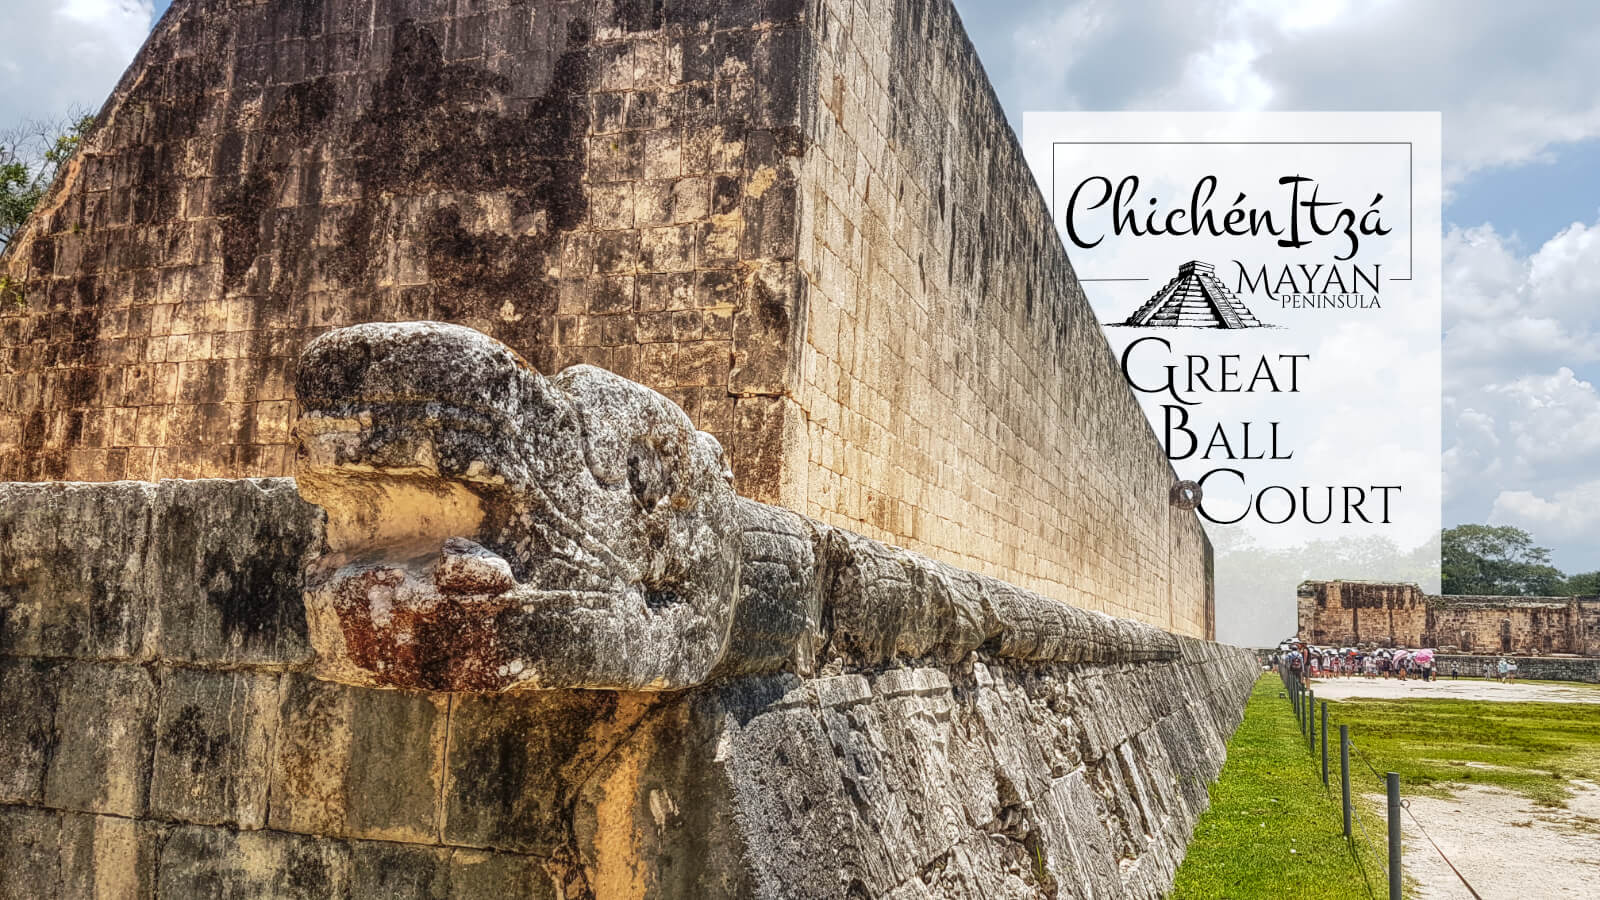 Great Ball Court in Chichén Itzá